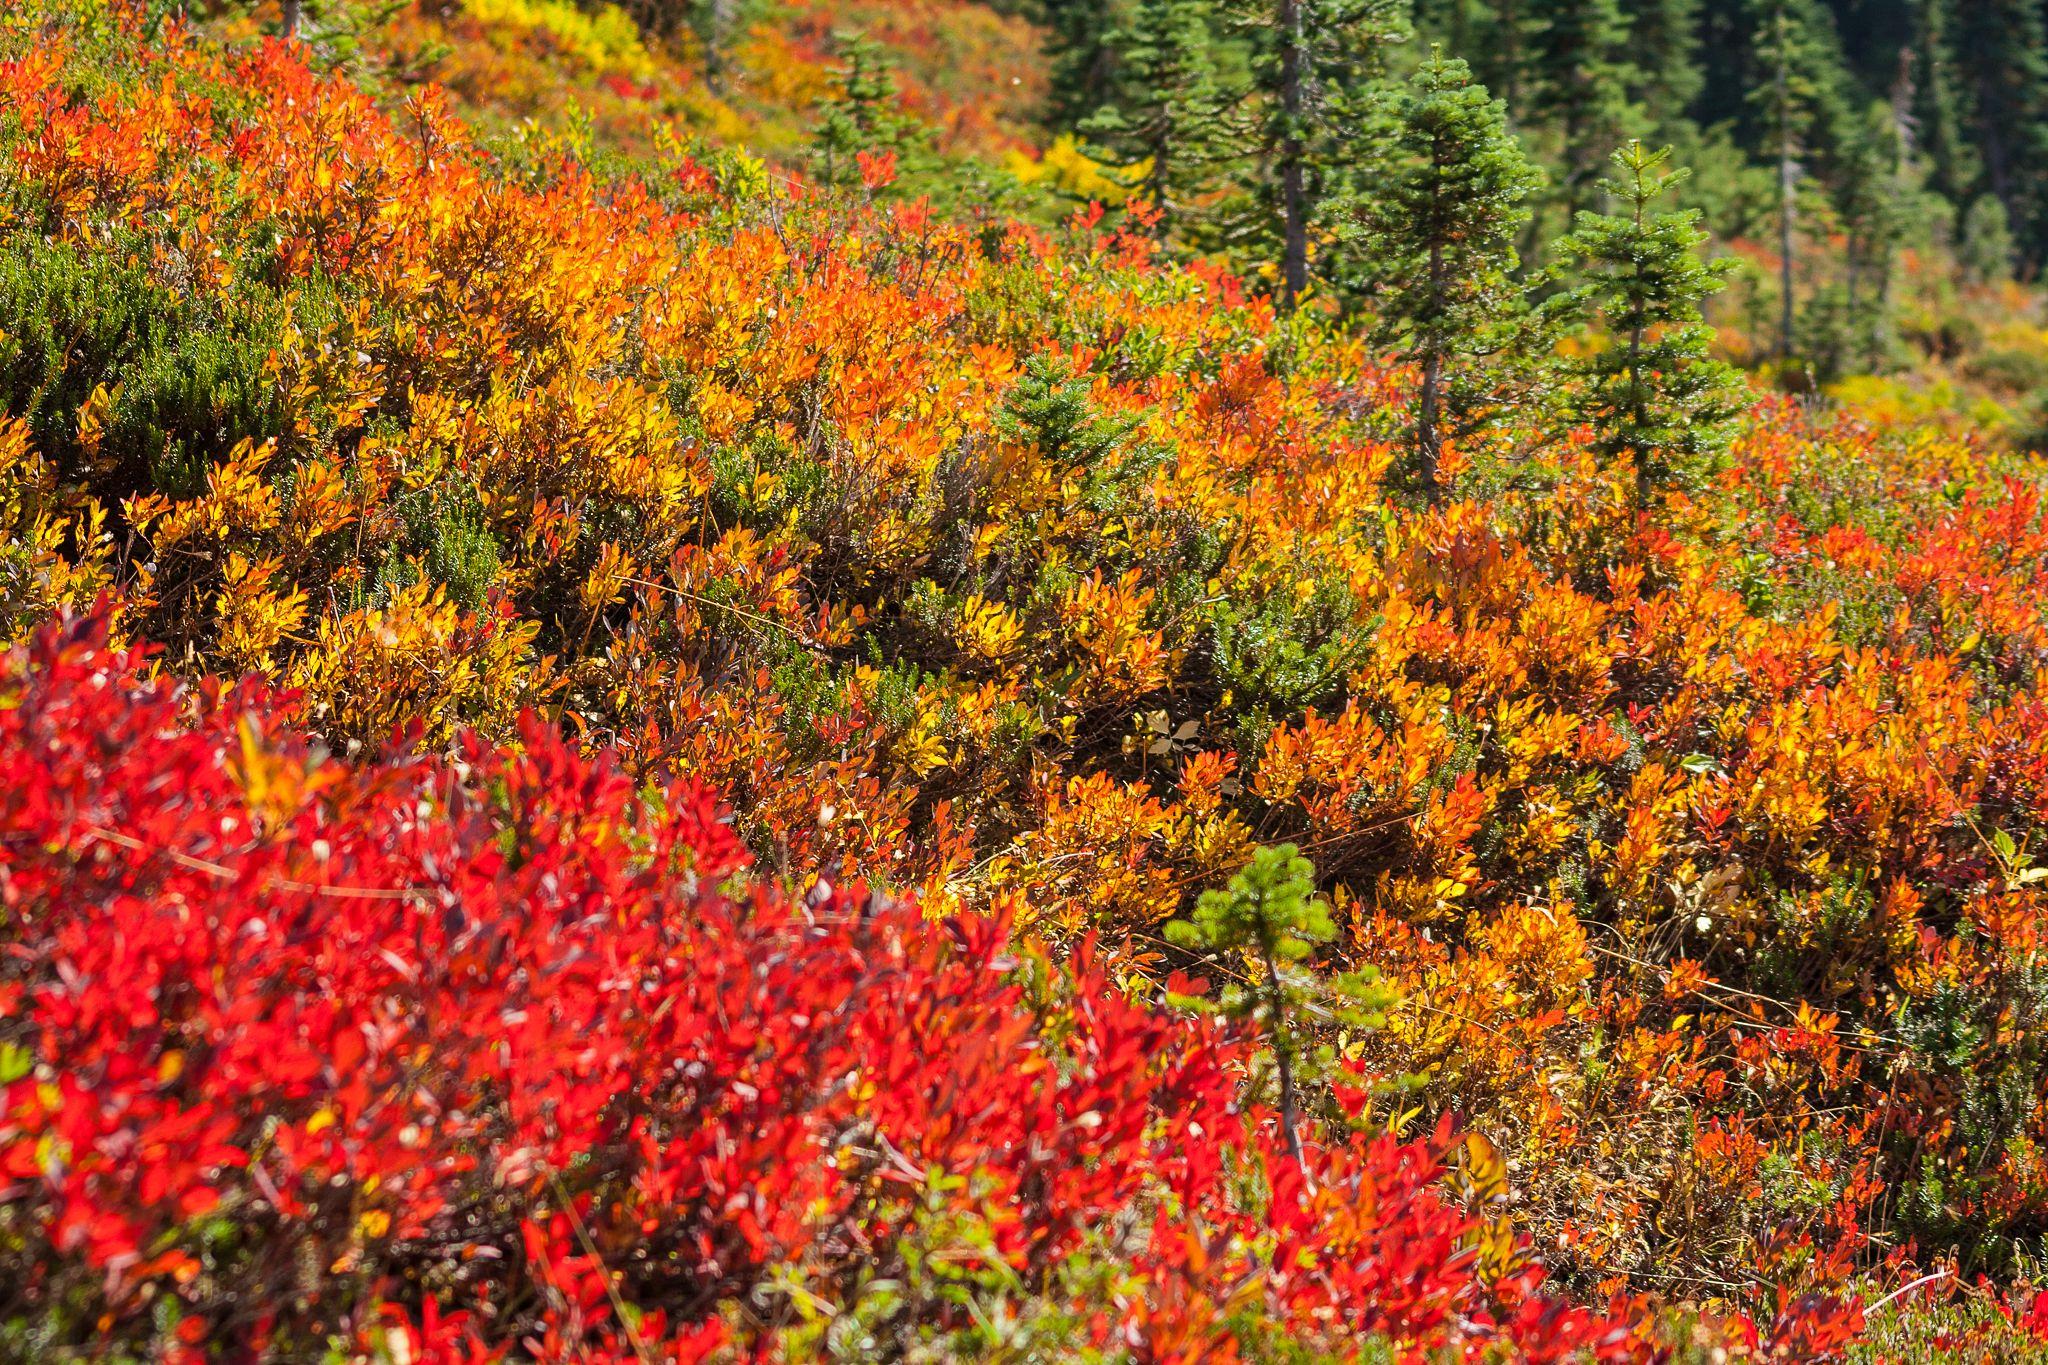 Sub-alpine wildflowers